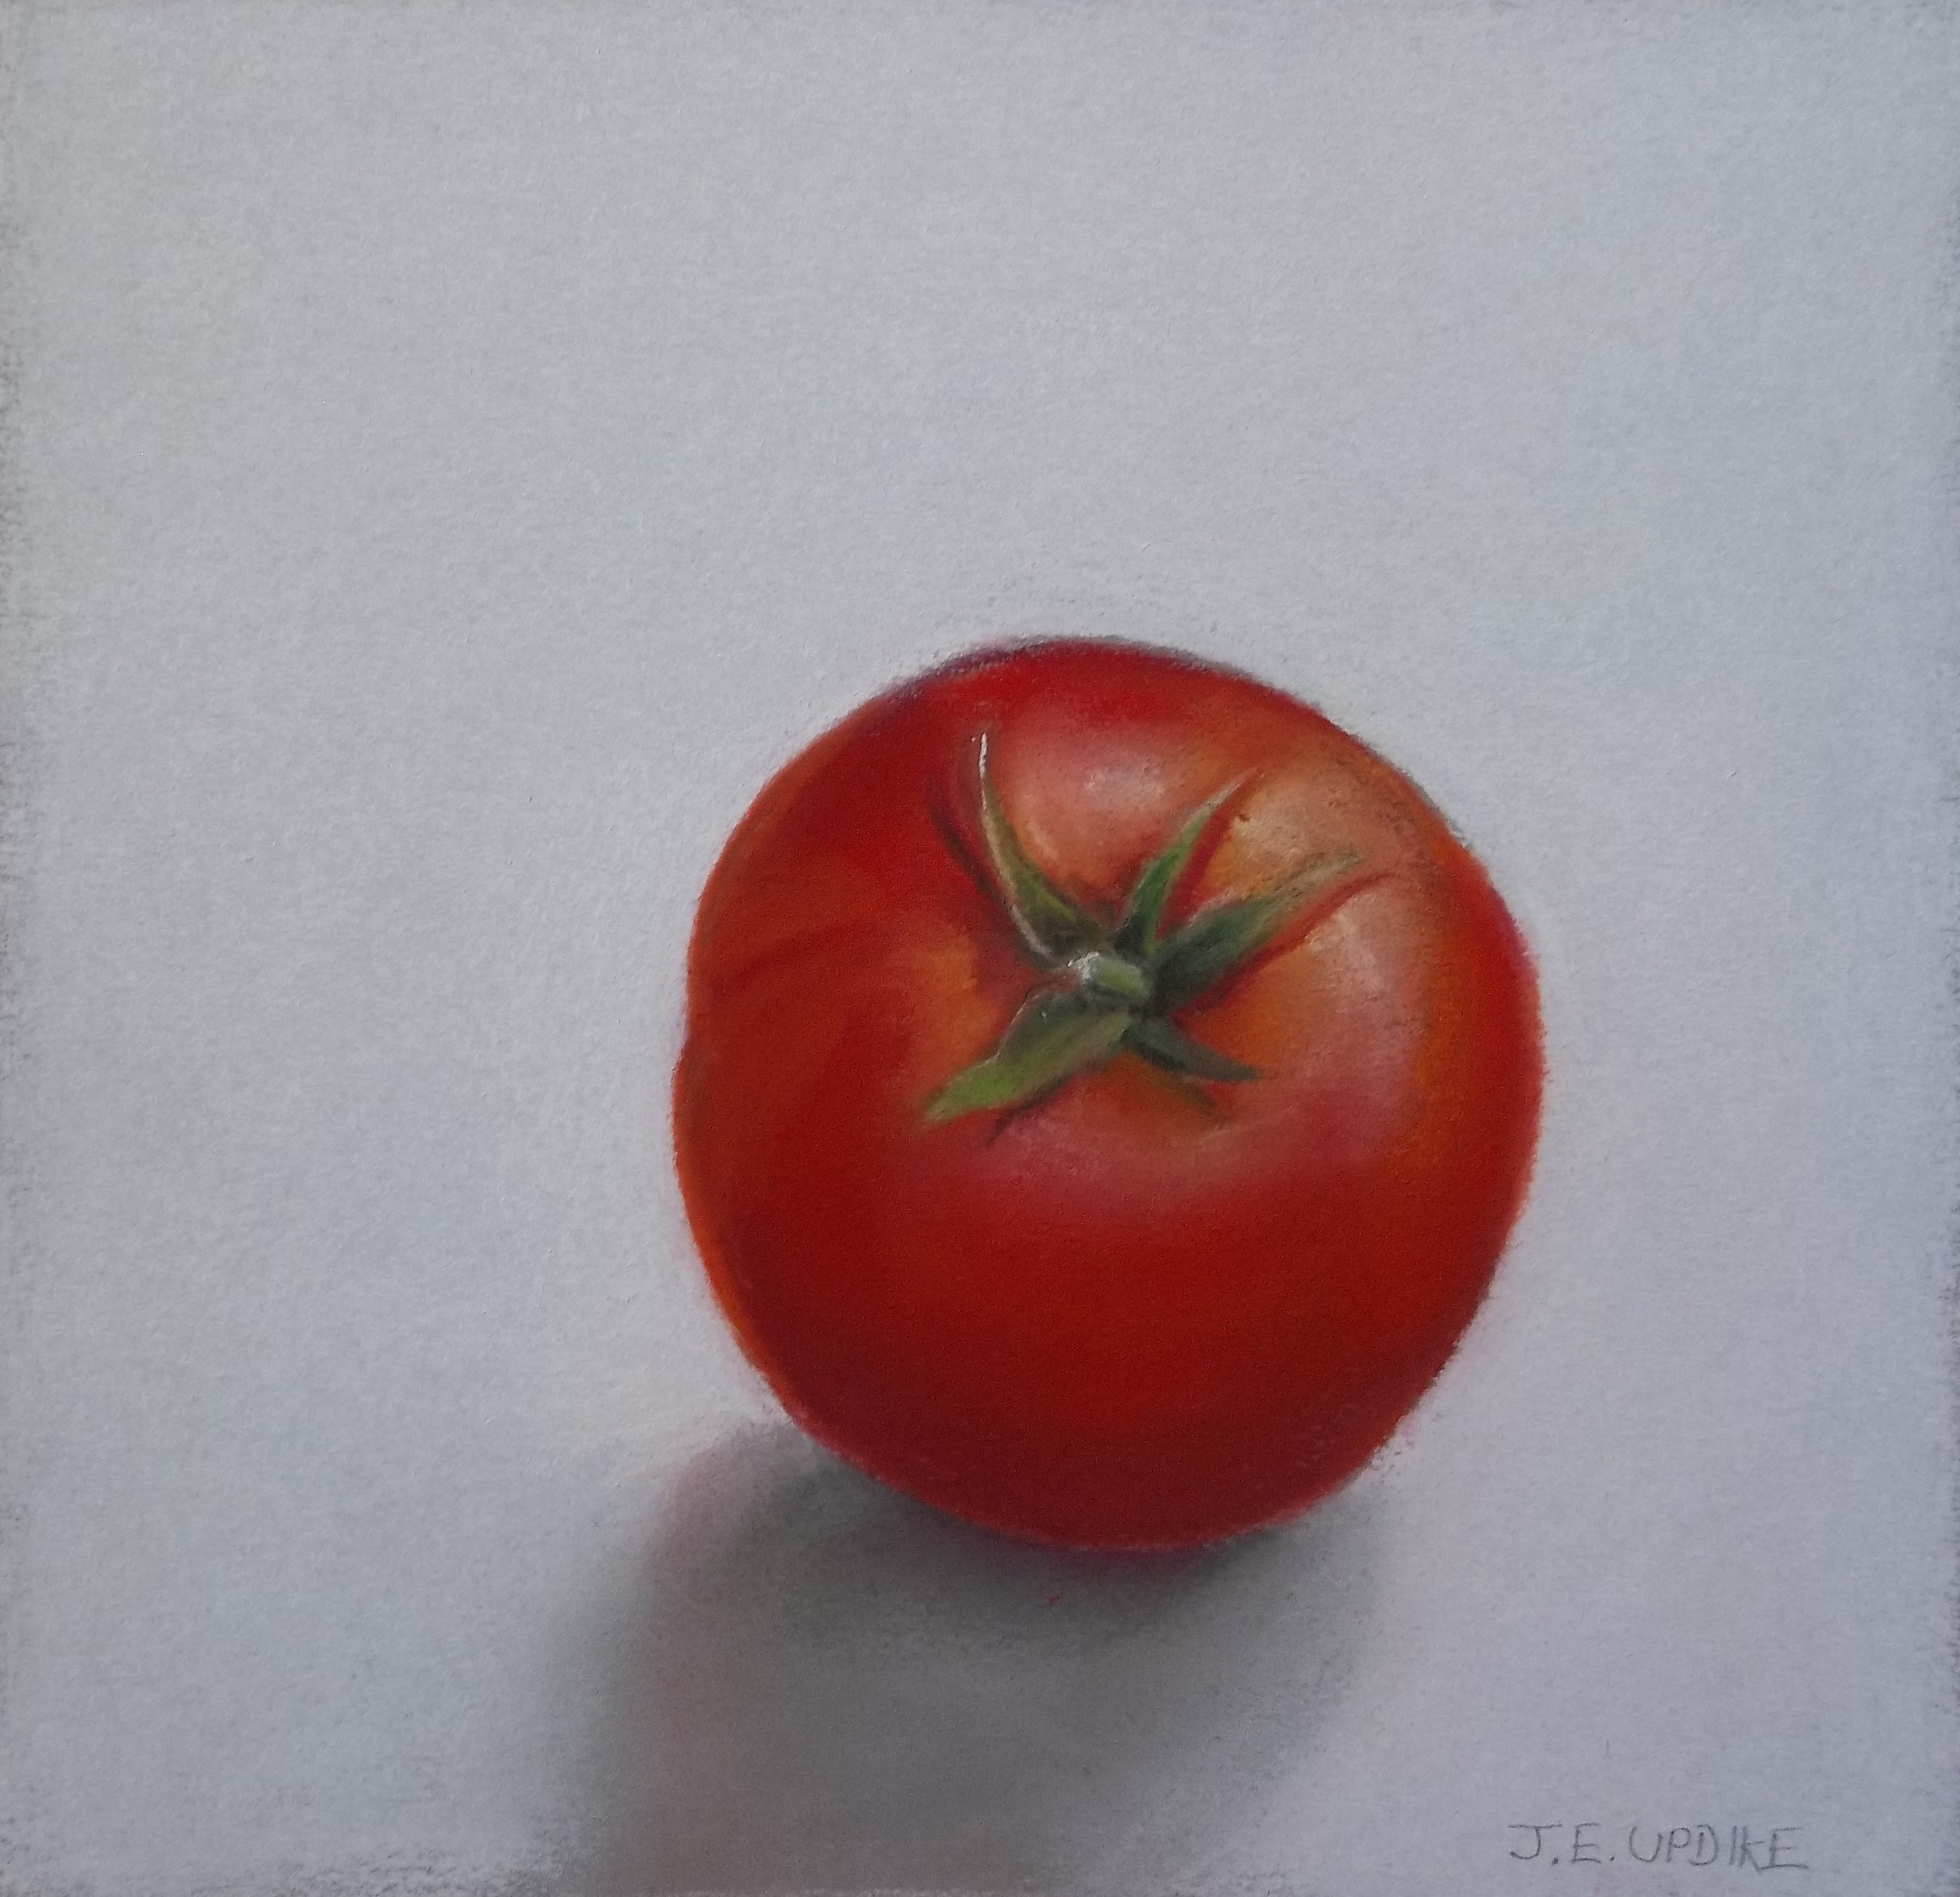 Tomato VI